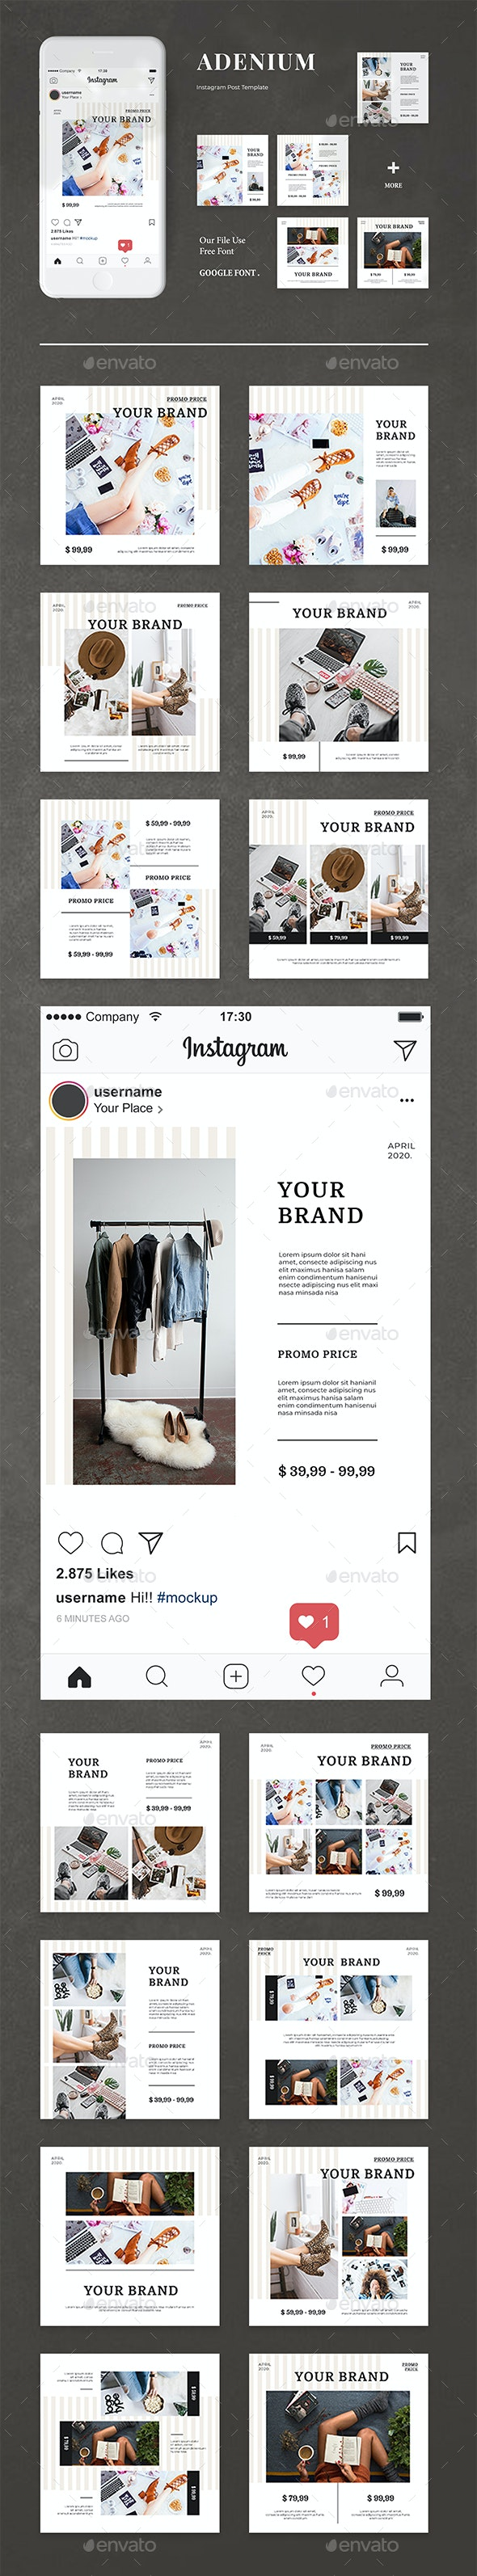 Adenium - Instagram Post Template - Social Media Web Elements